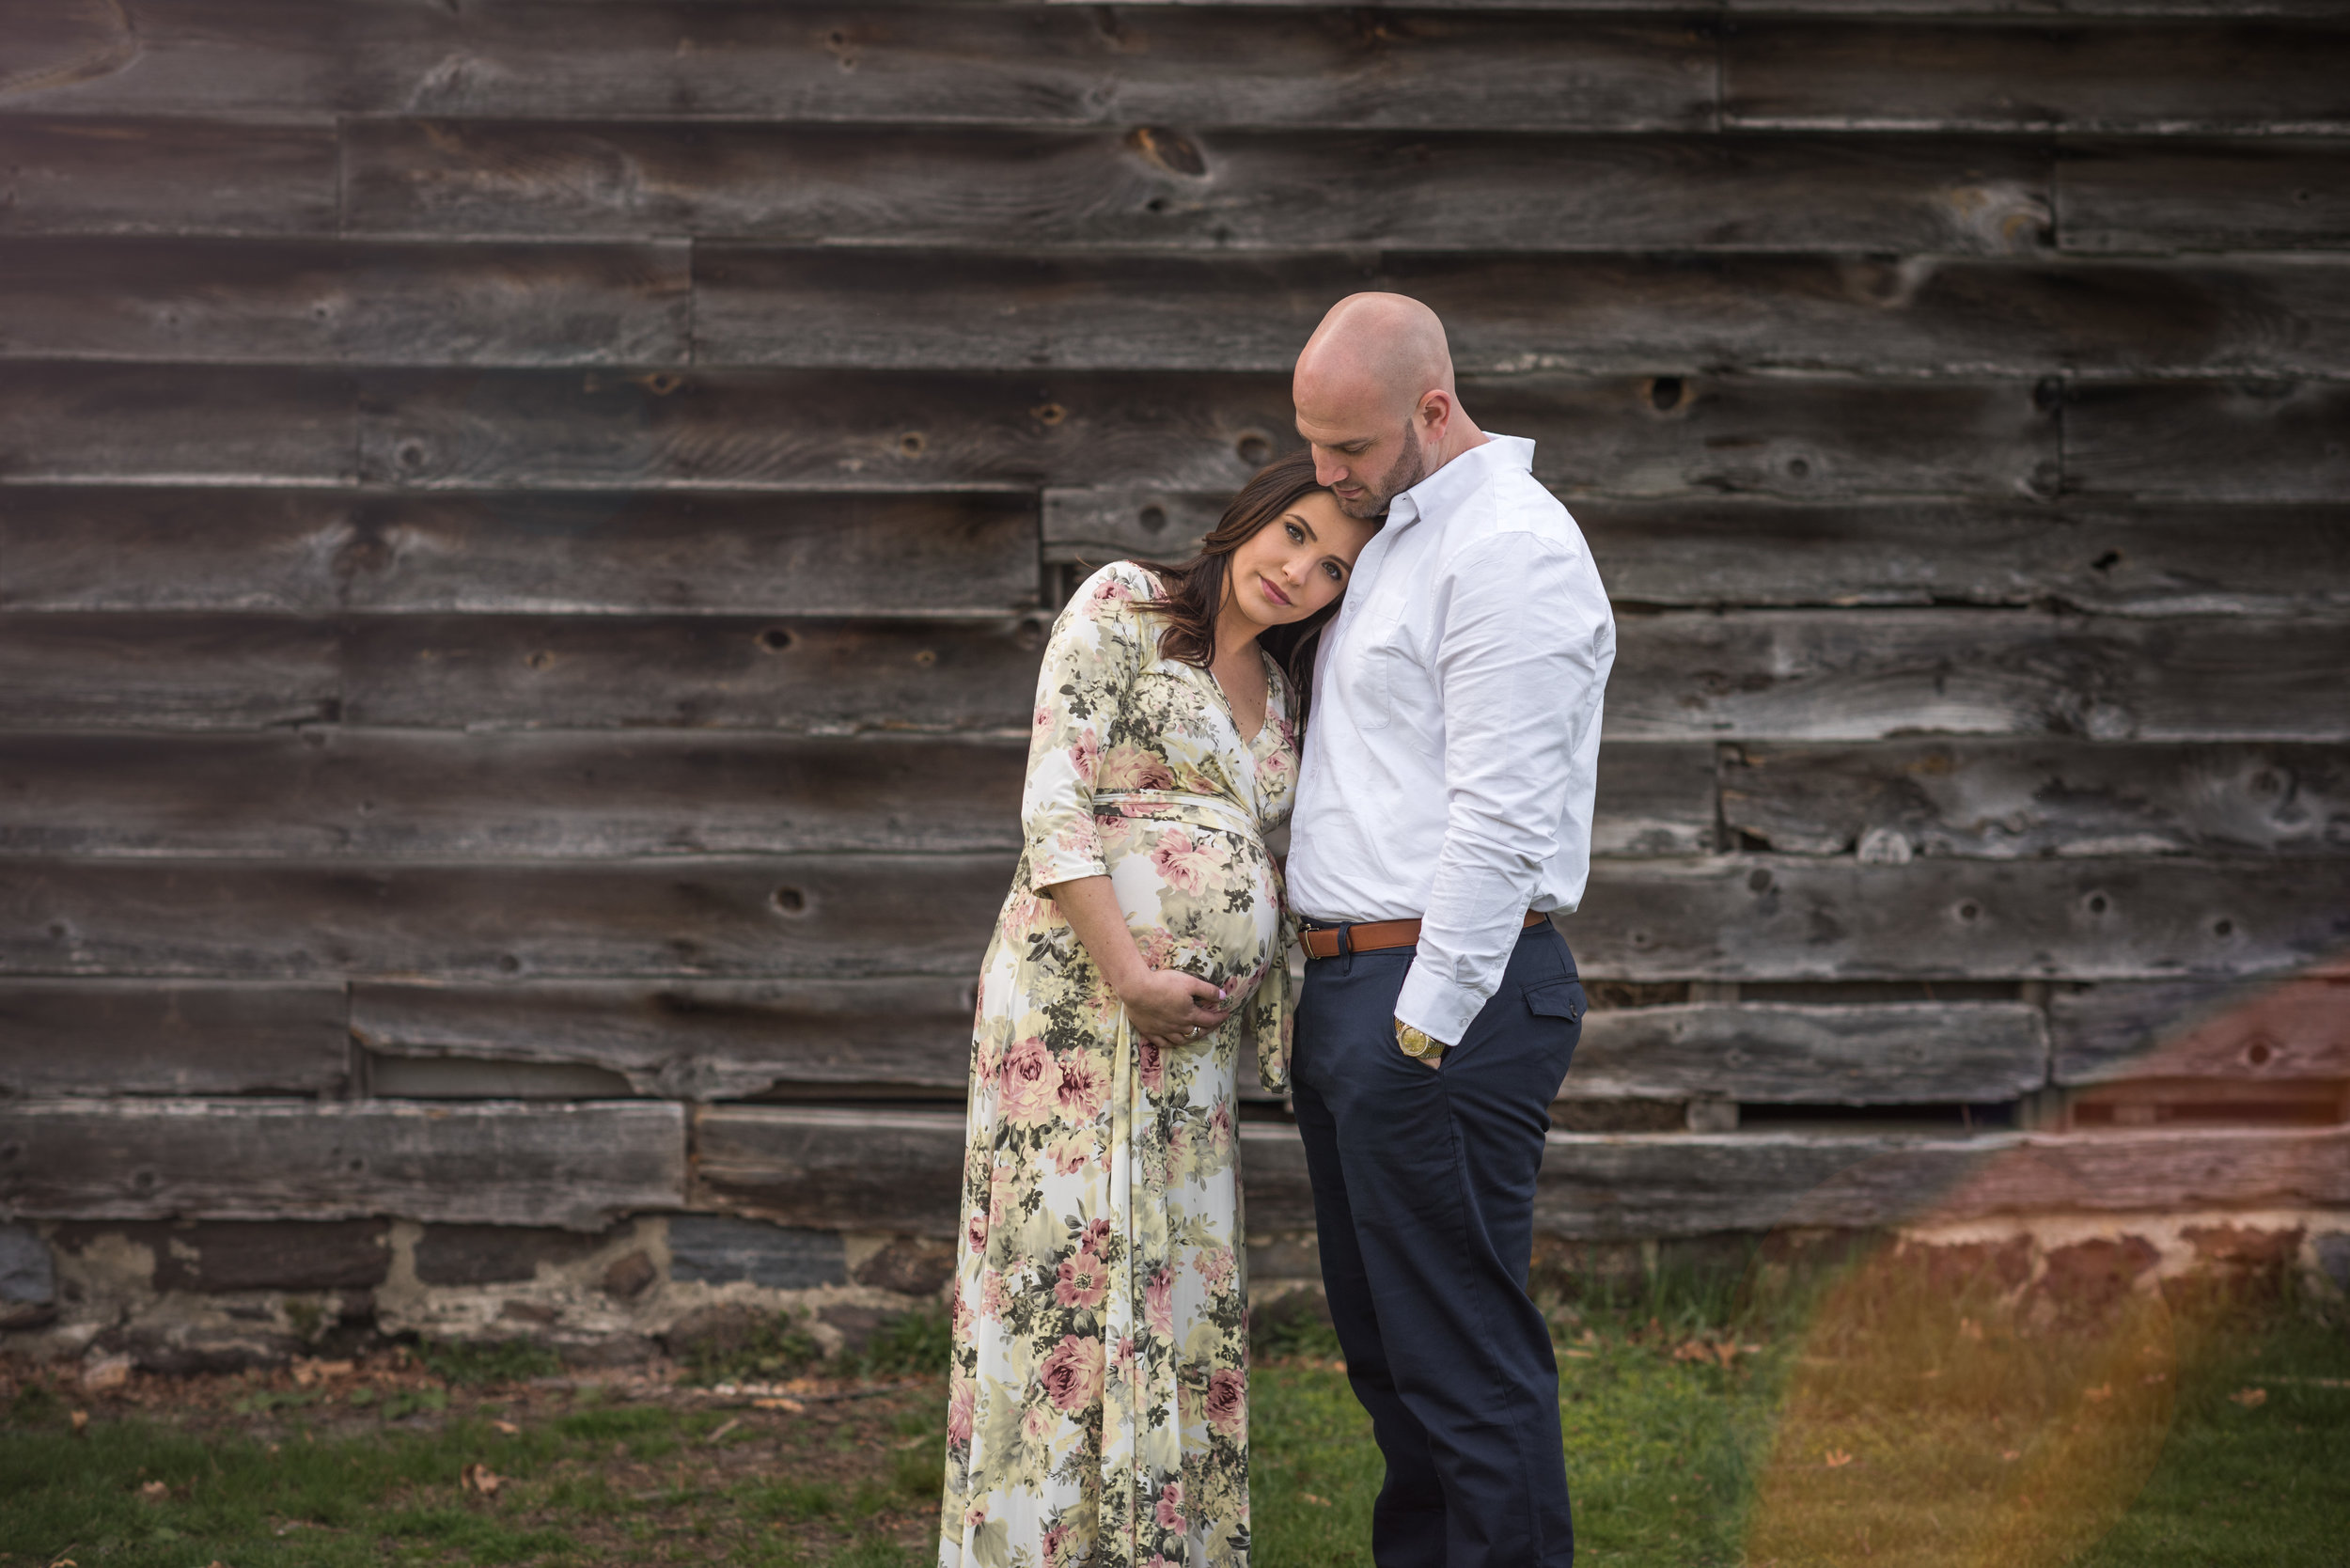 Allaire State Park Maternity Photo, Kristen 13